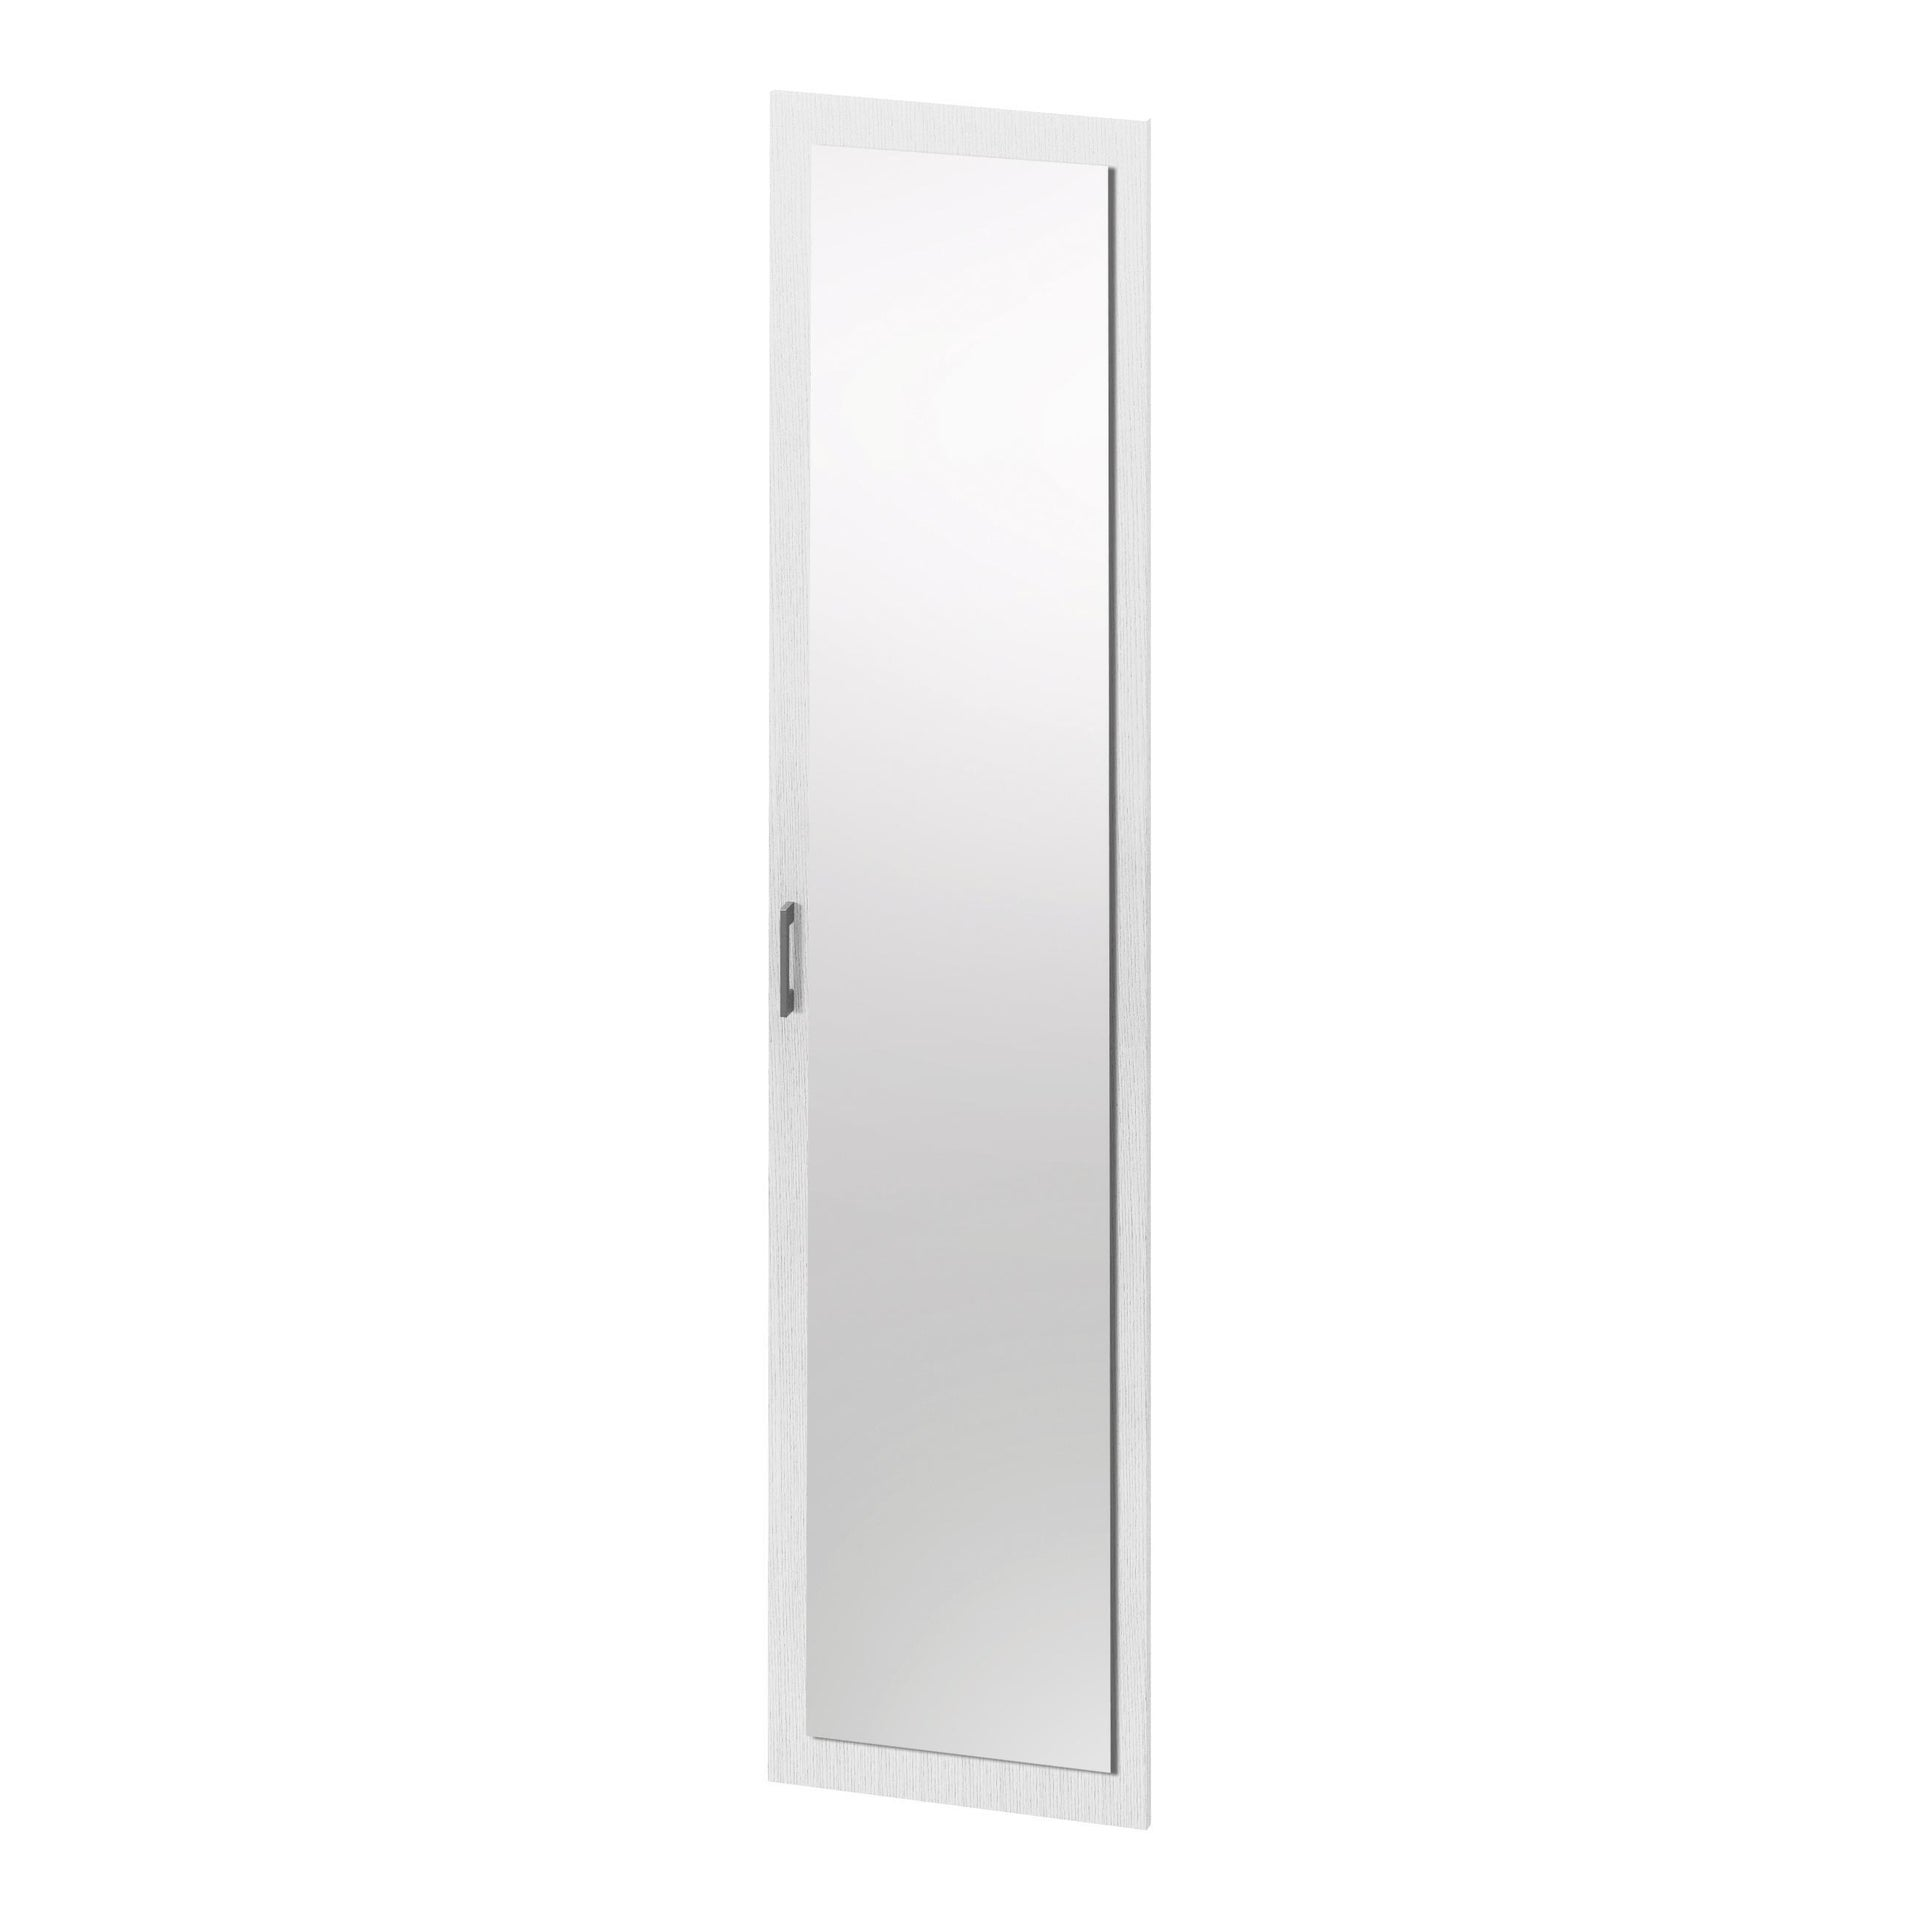 Anta Spaceo L 45 x H 192 cm bianco